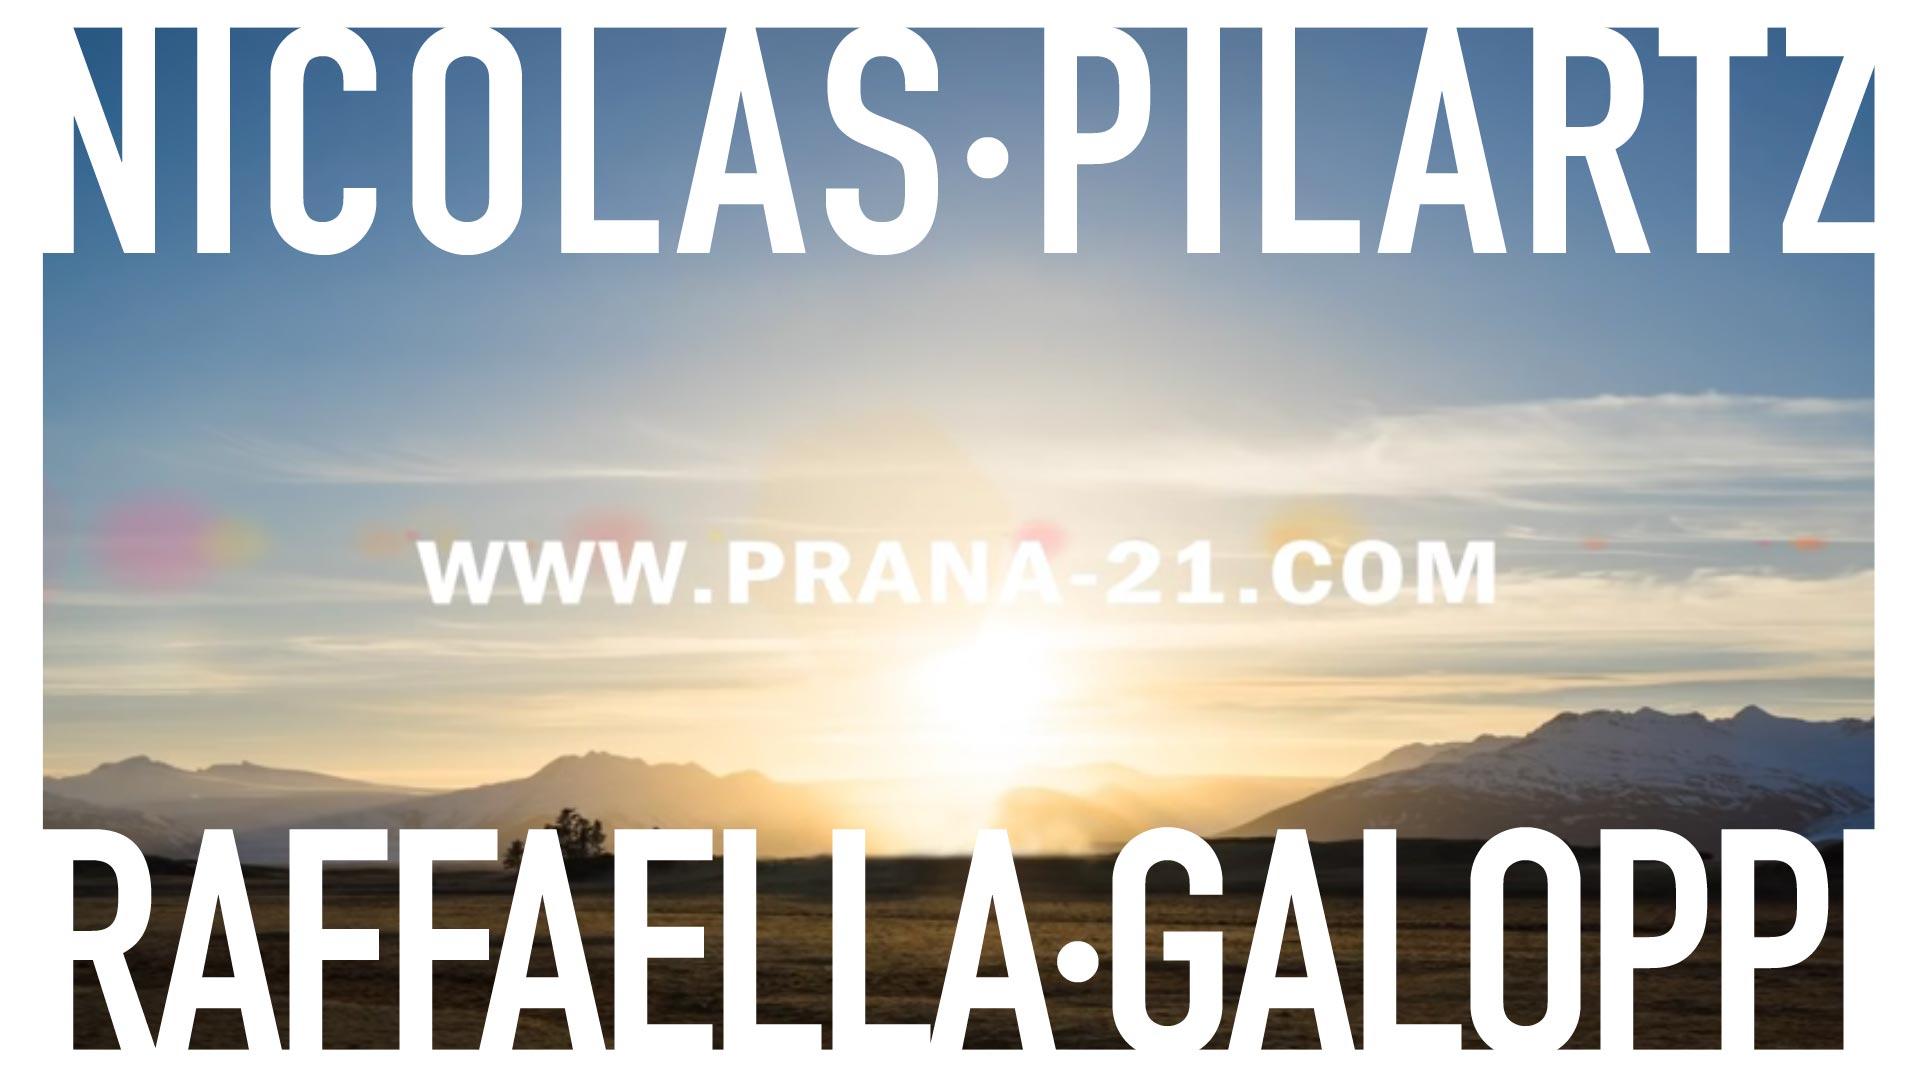 Nicolas Pilartz Raffaella Galoppi